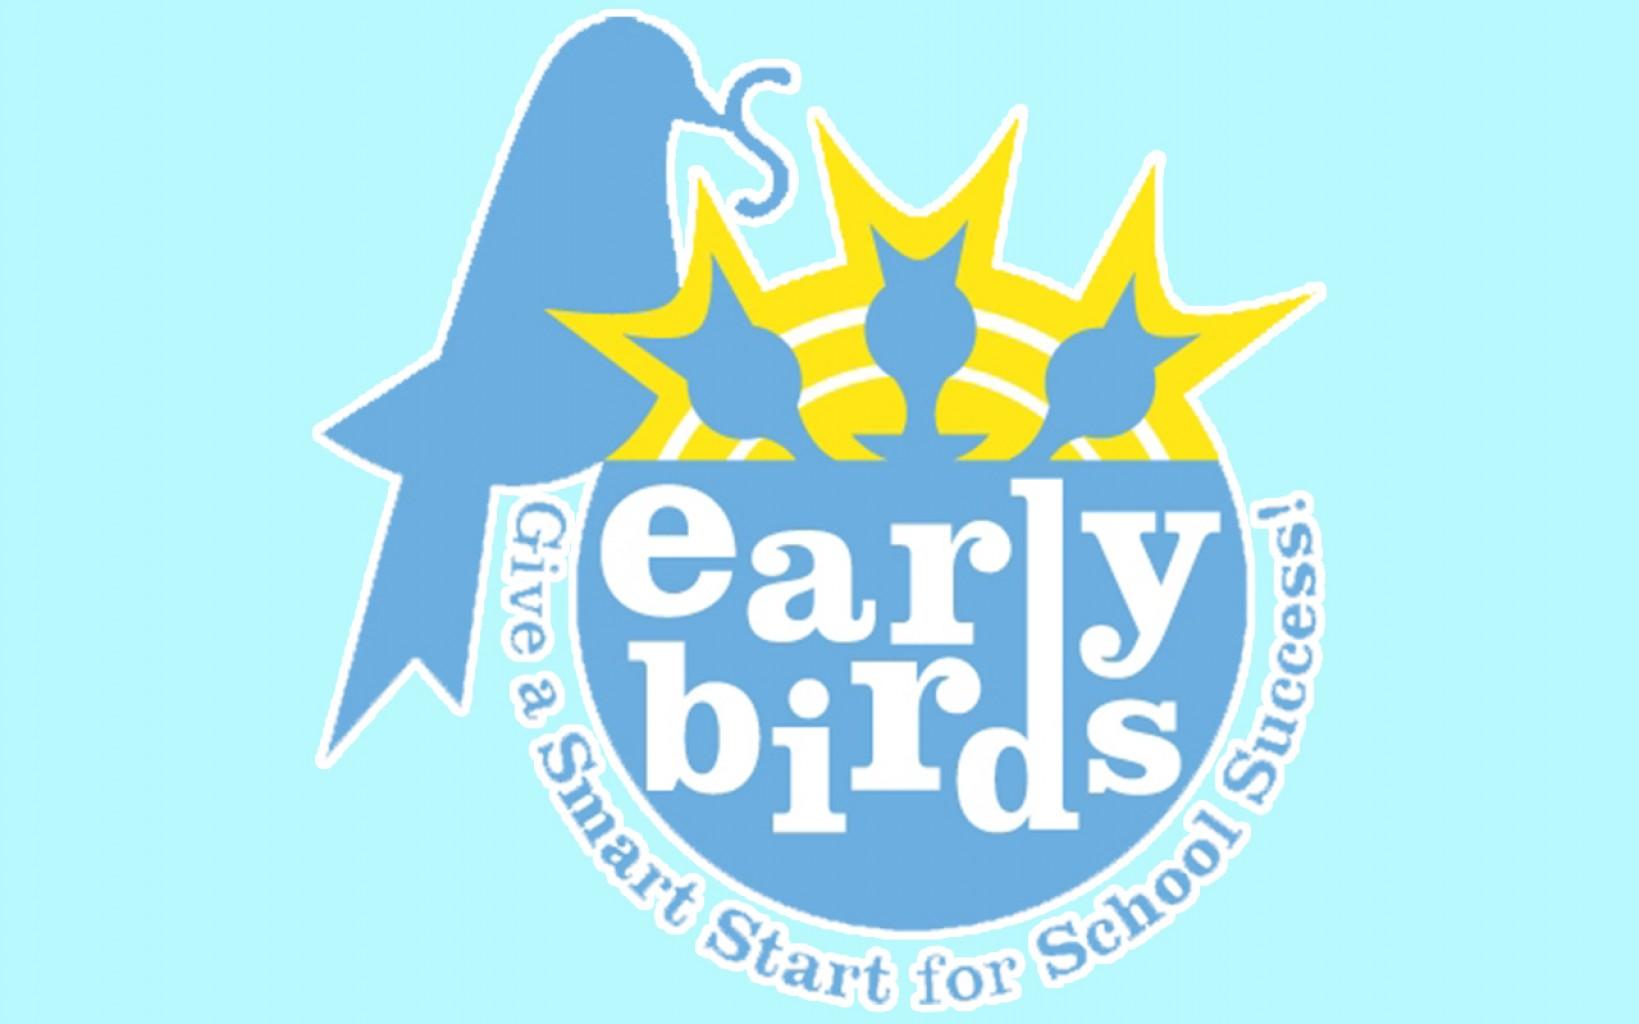 ¡Bienvenidos a Early Birds! Guía para abuelos calientes